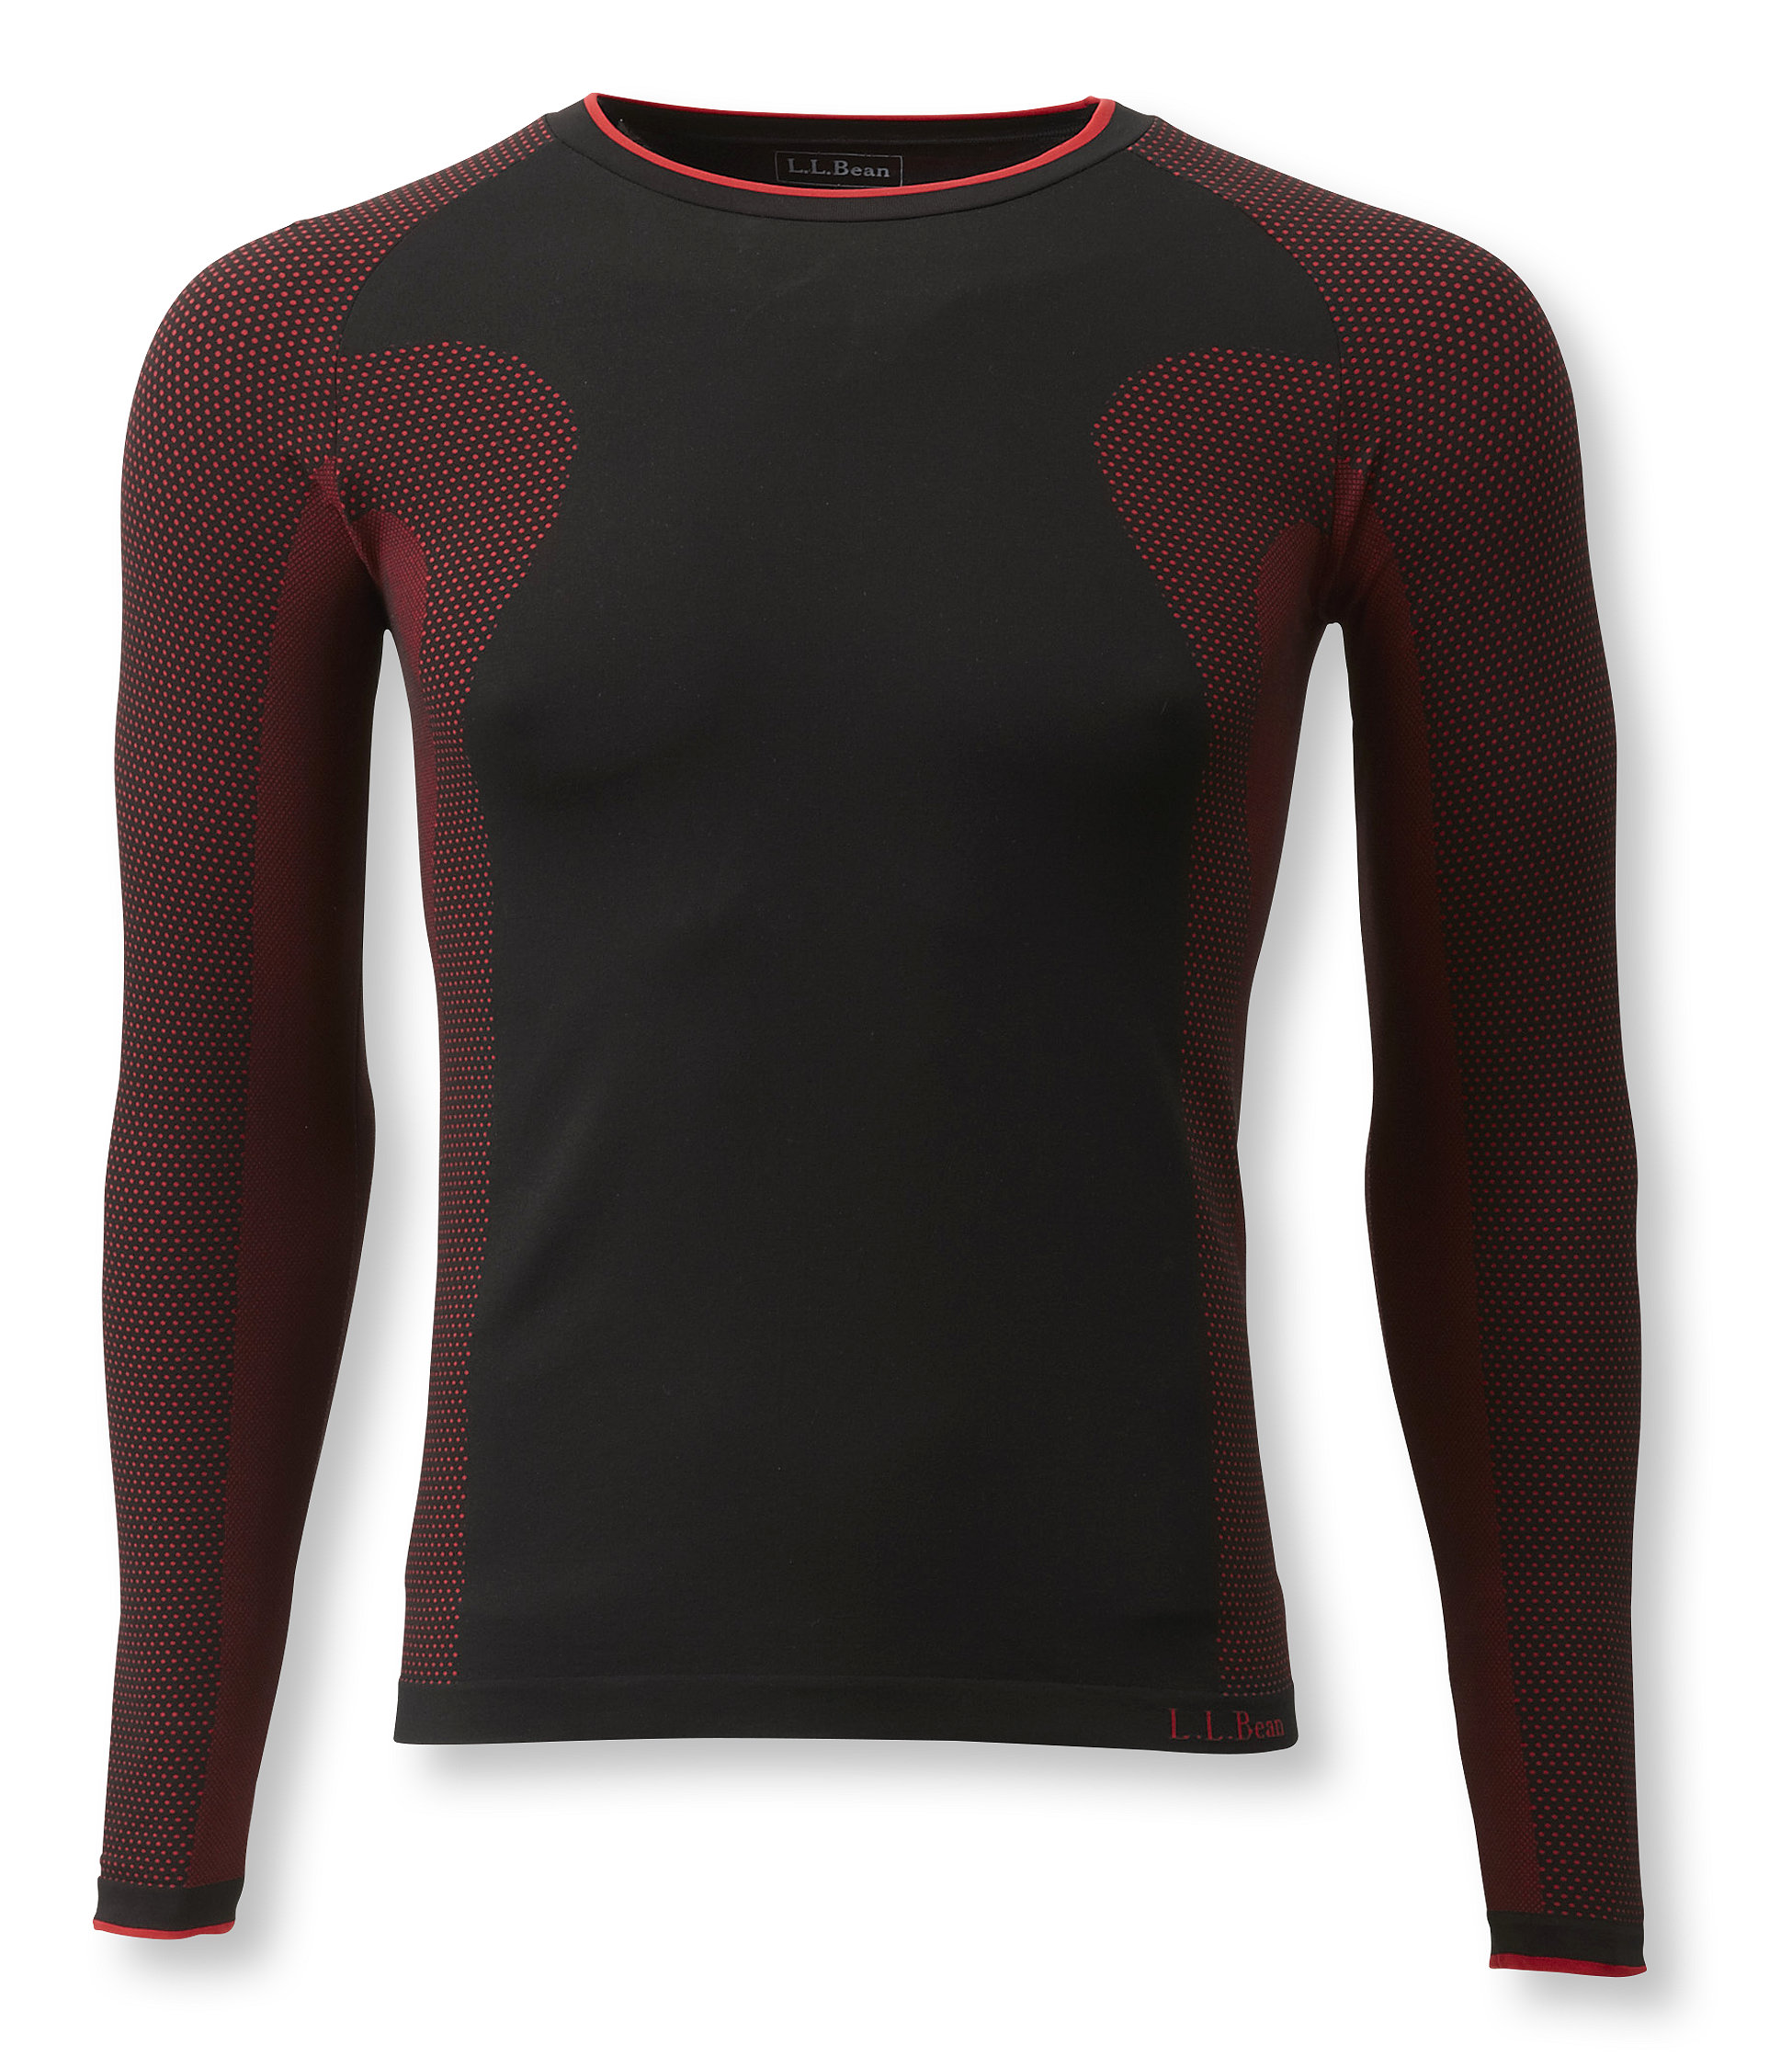 L.L.Bean Polypro Base Layer Underwear, Long-Sleeve Crew